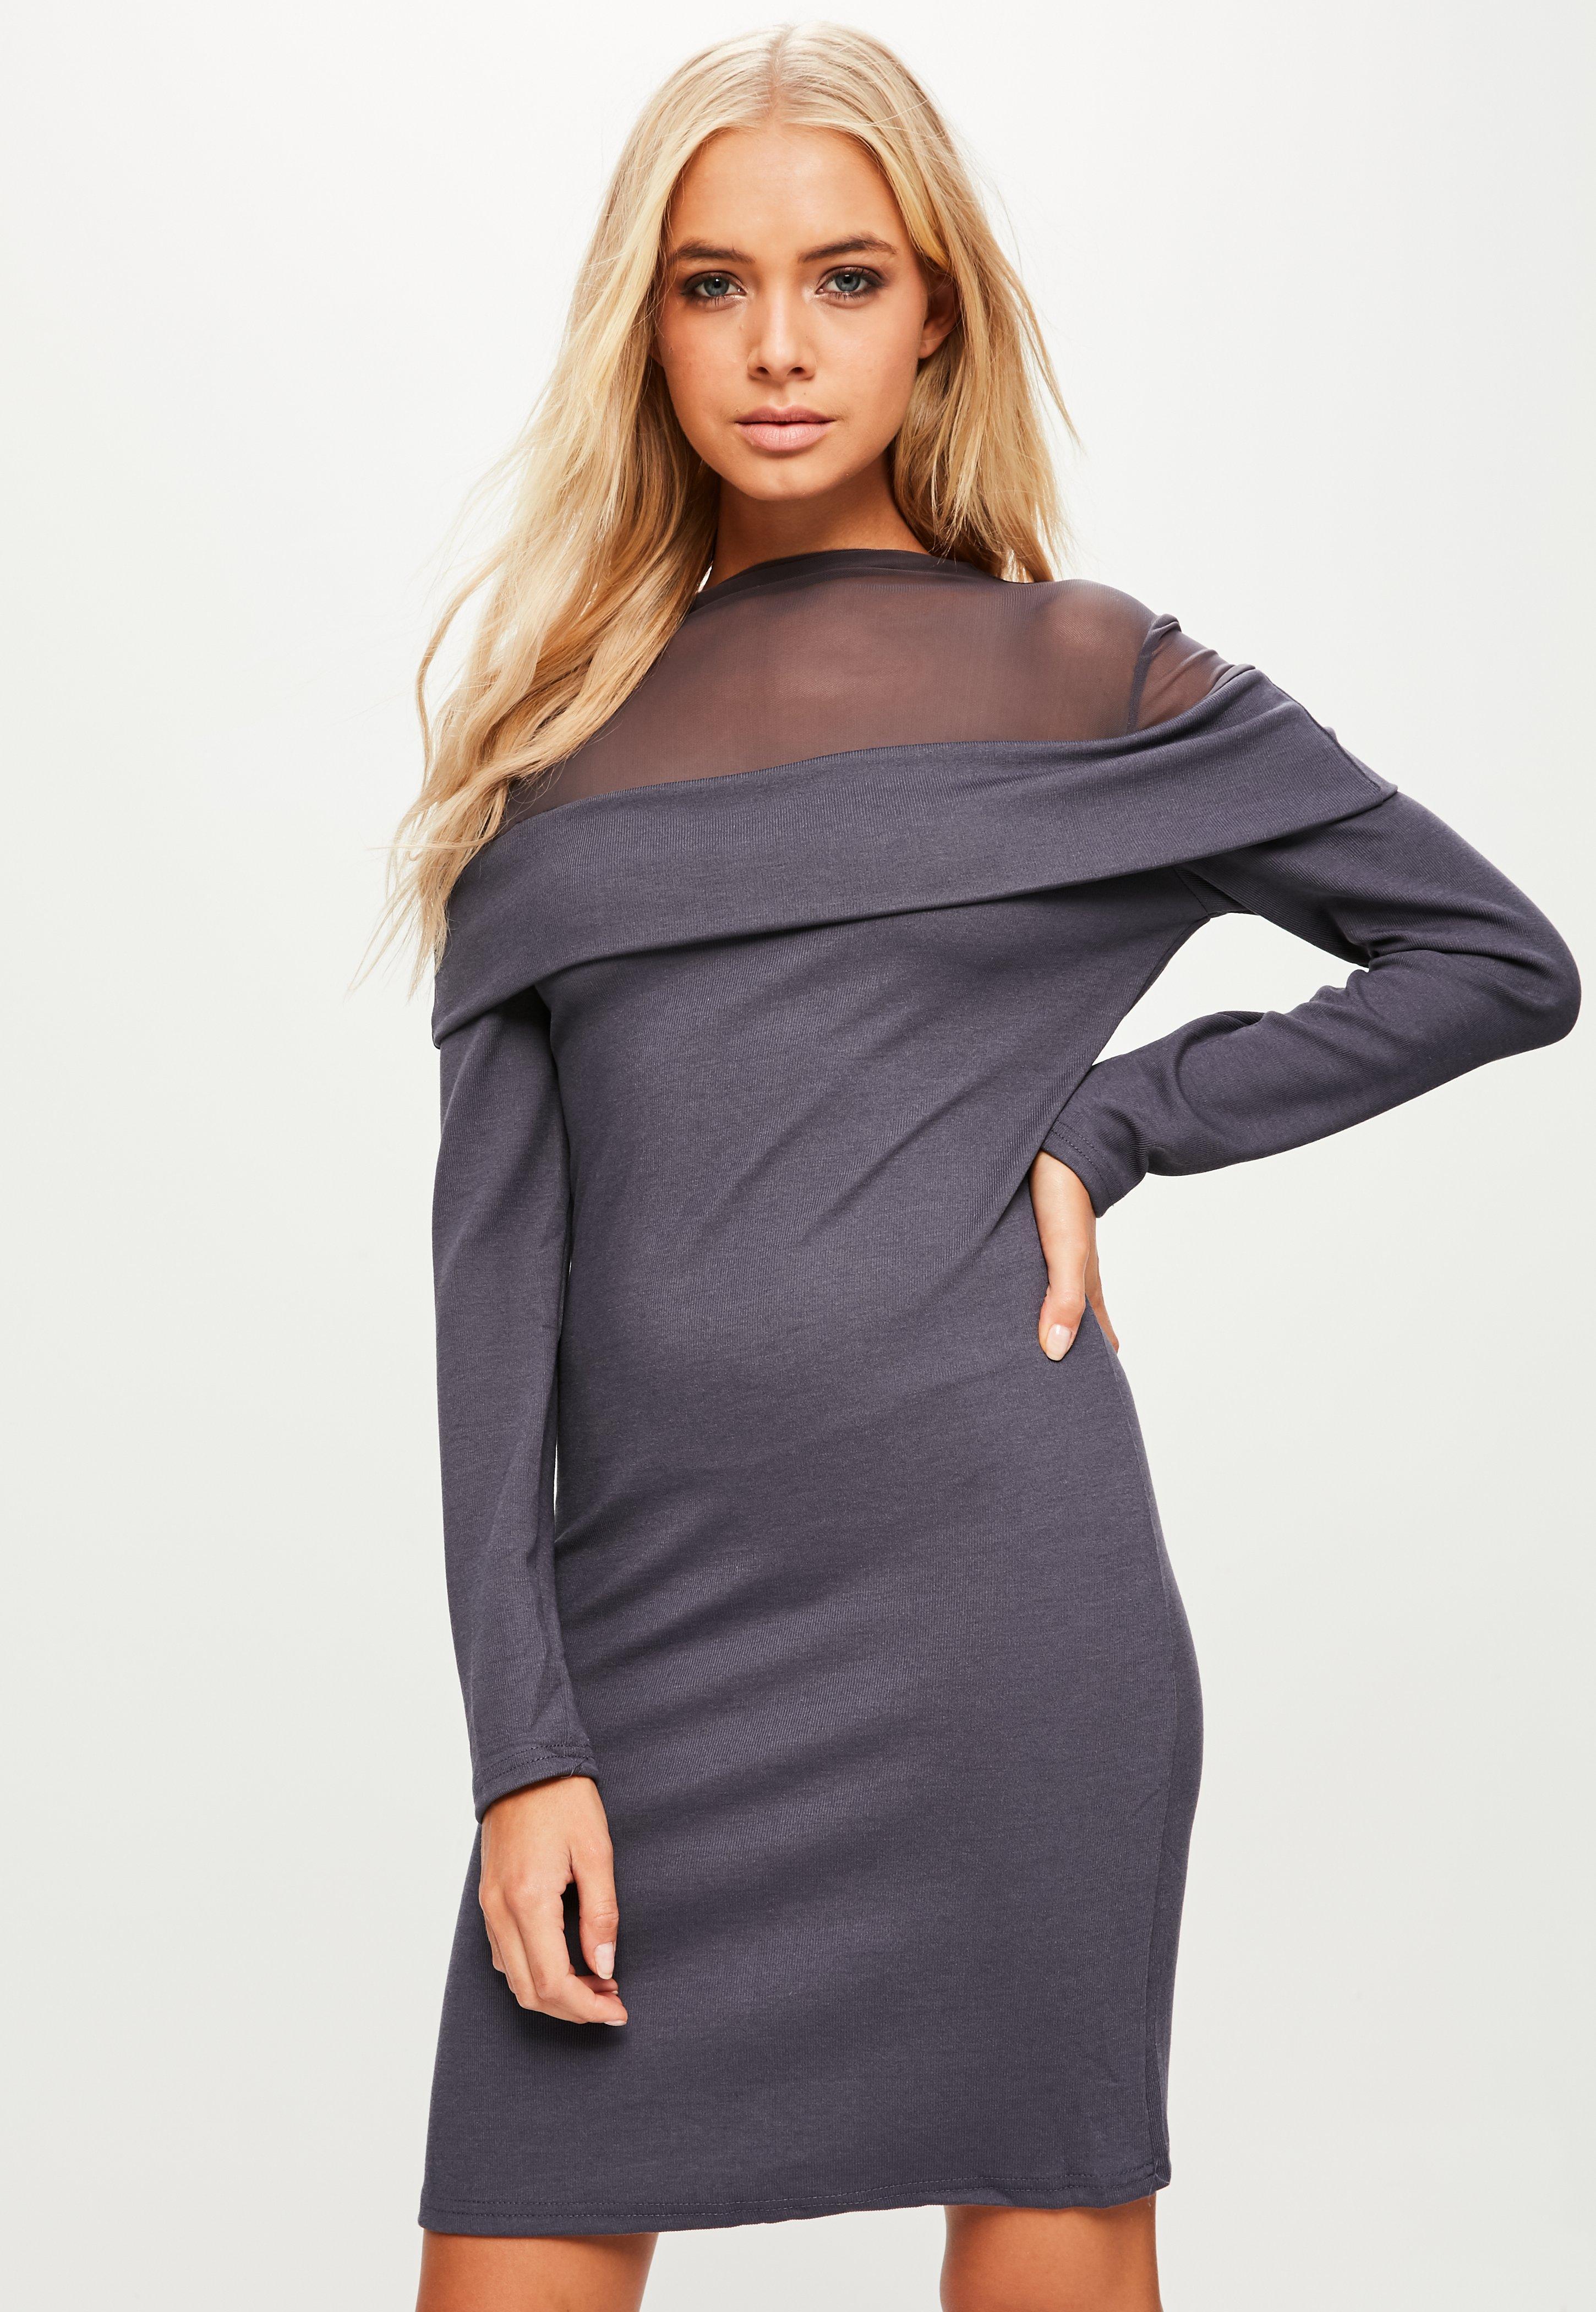 Grey Mesh Insert Sweater Dress | Missguided